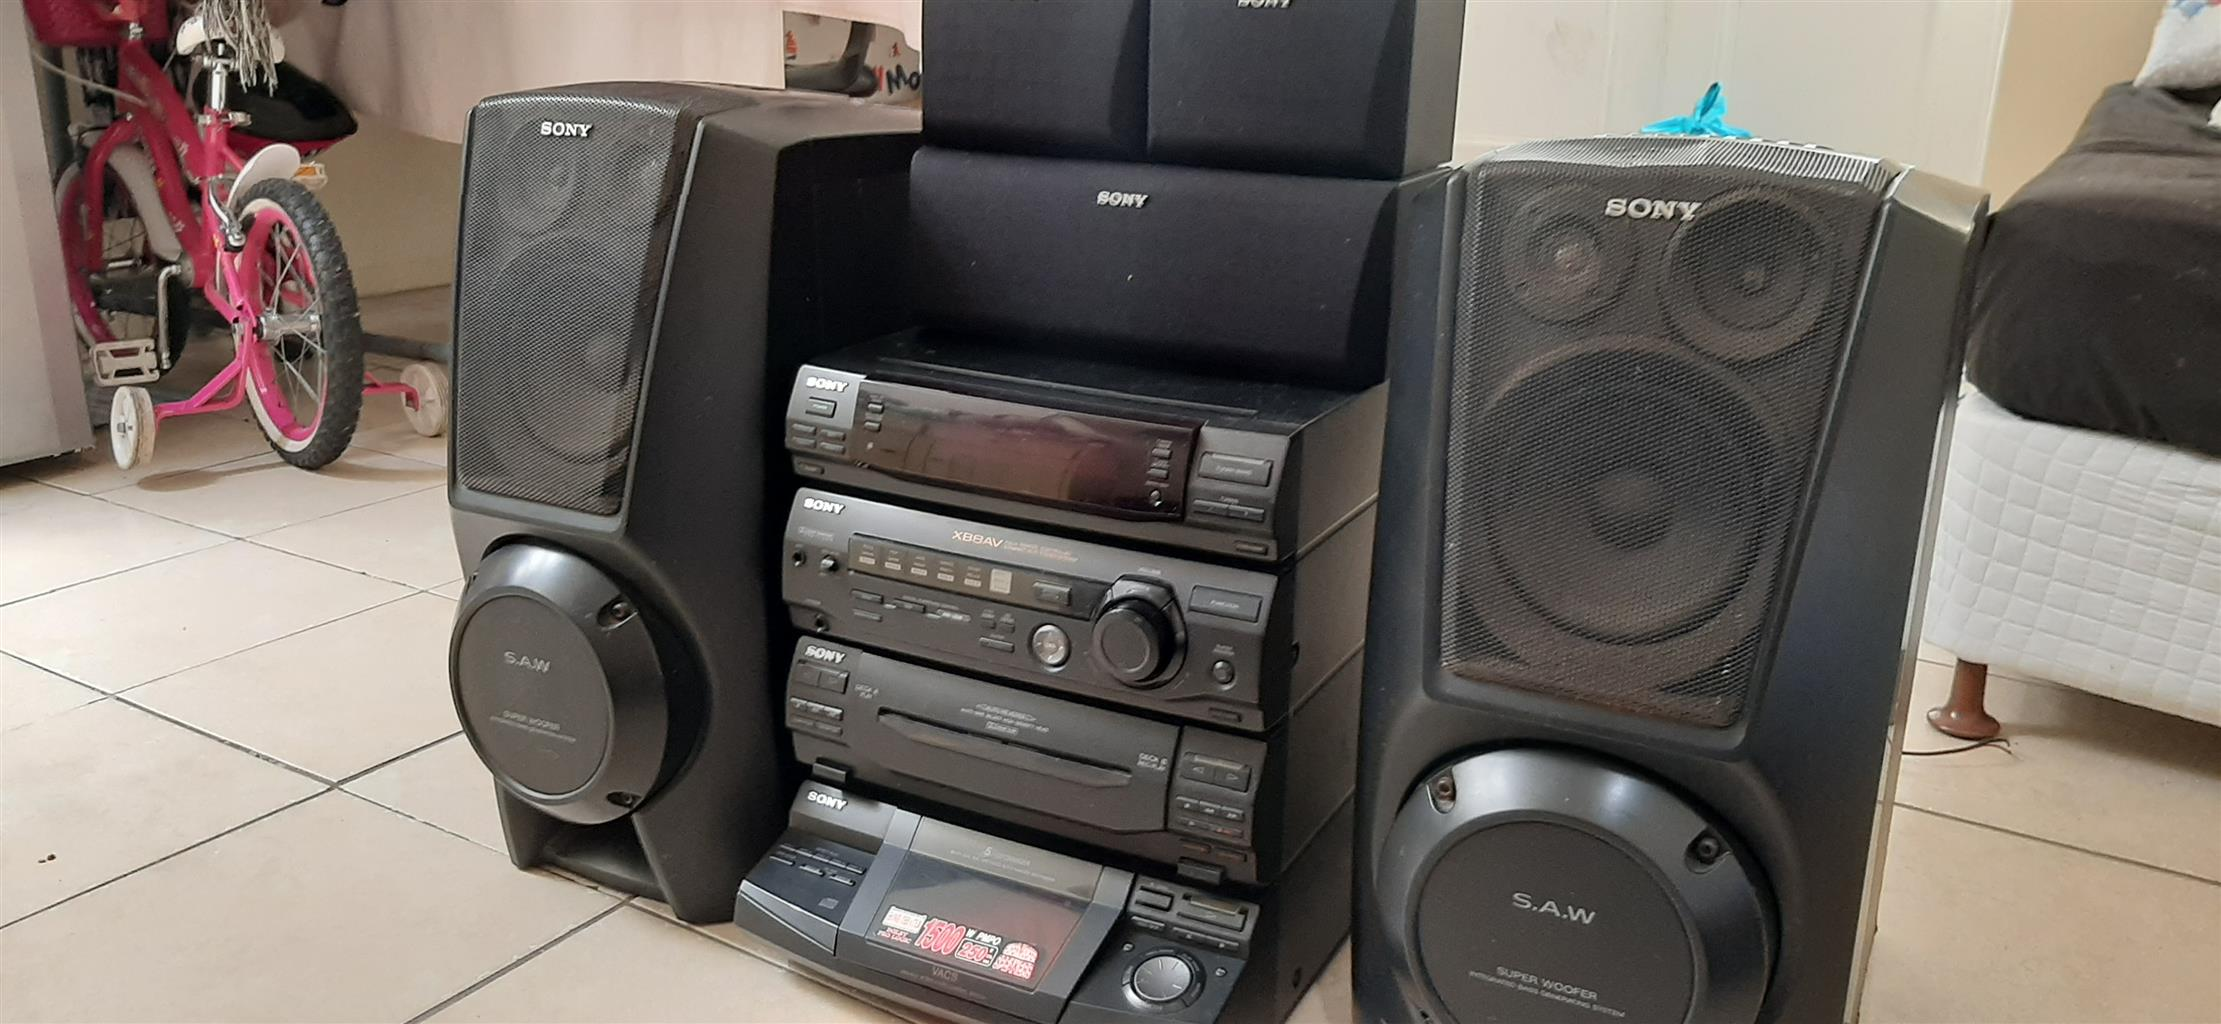 Sony HiFi theatre system